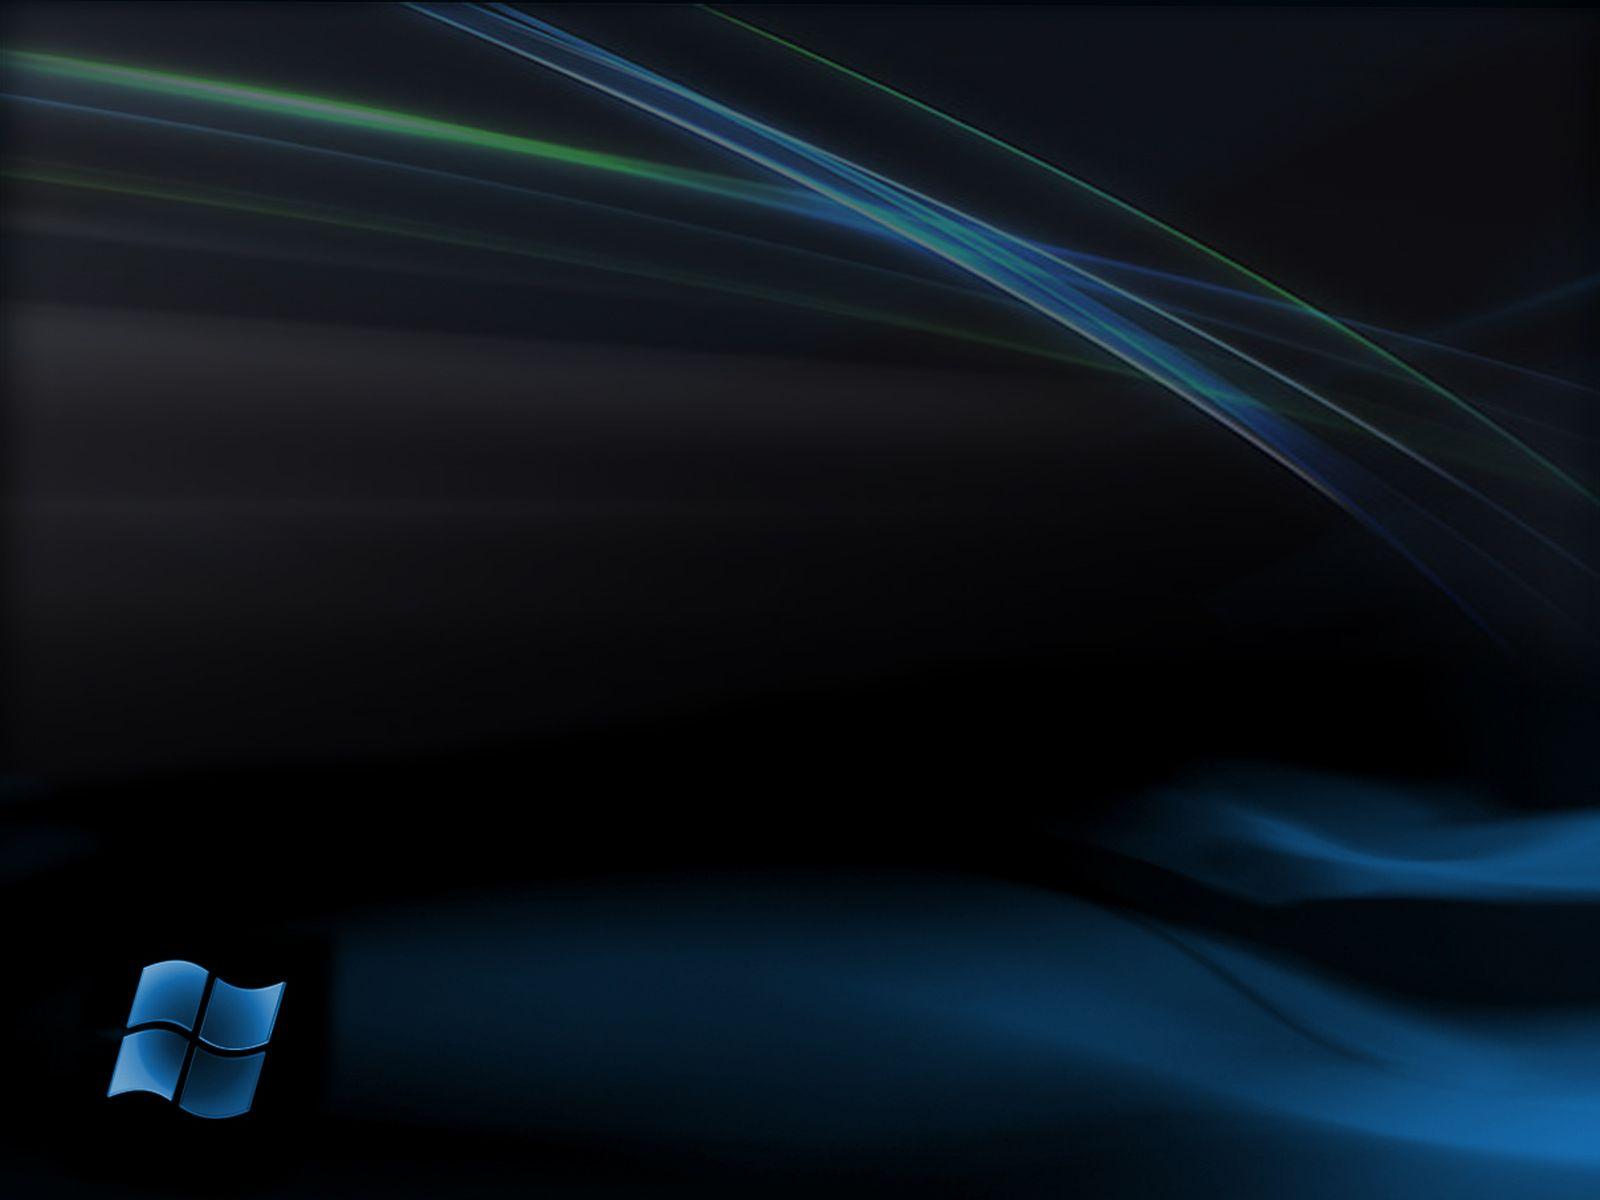 X Hd Desktop Wallpaper Windows